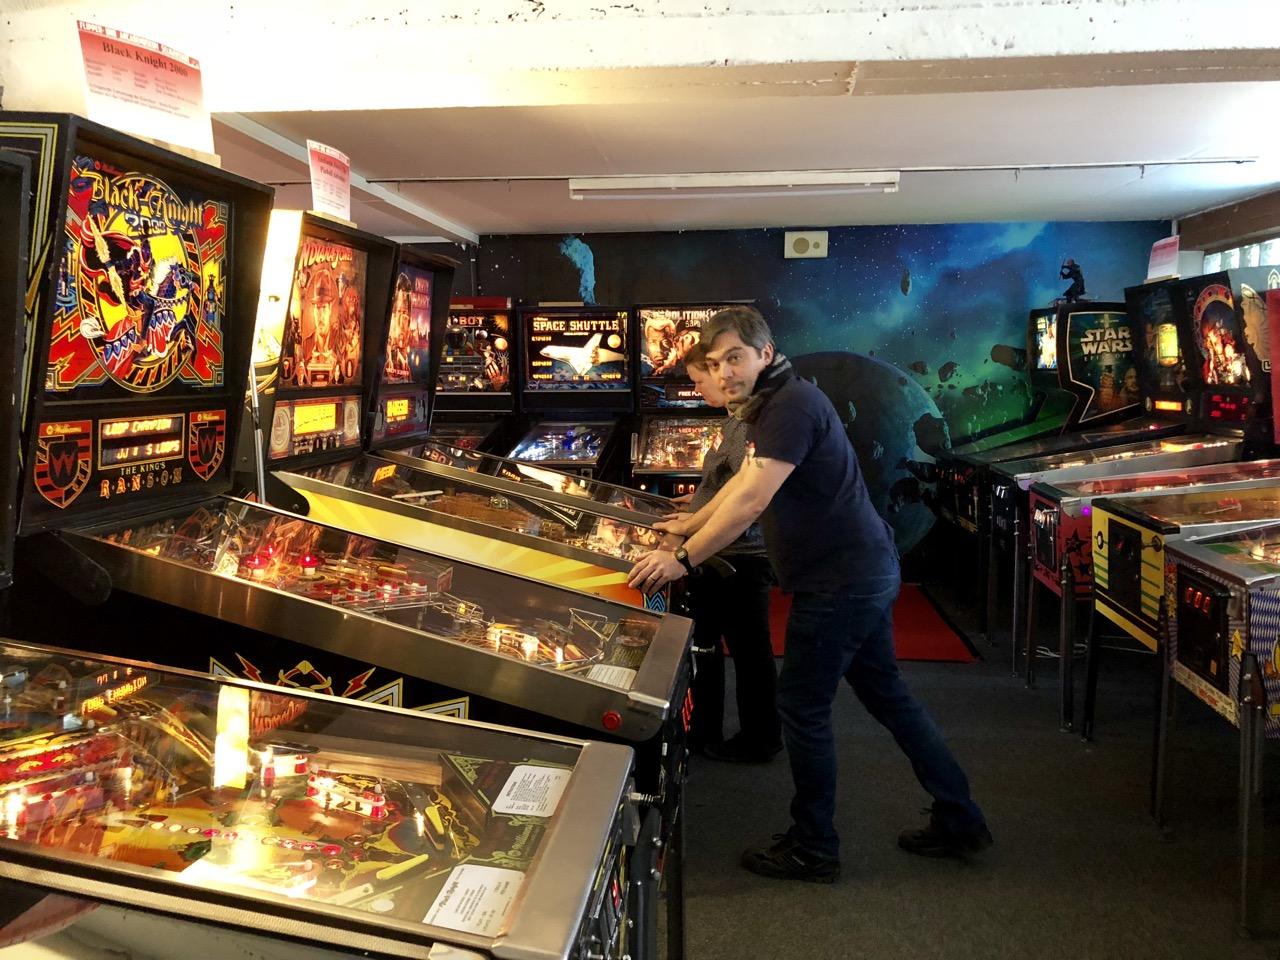 So muss Flippern. Das Museum bietet eine enorme Menge an wunderbar gepflegten Maschinen. (Bild: André Eymann)